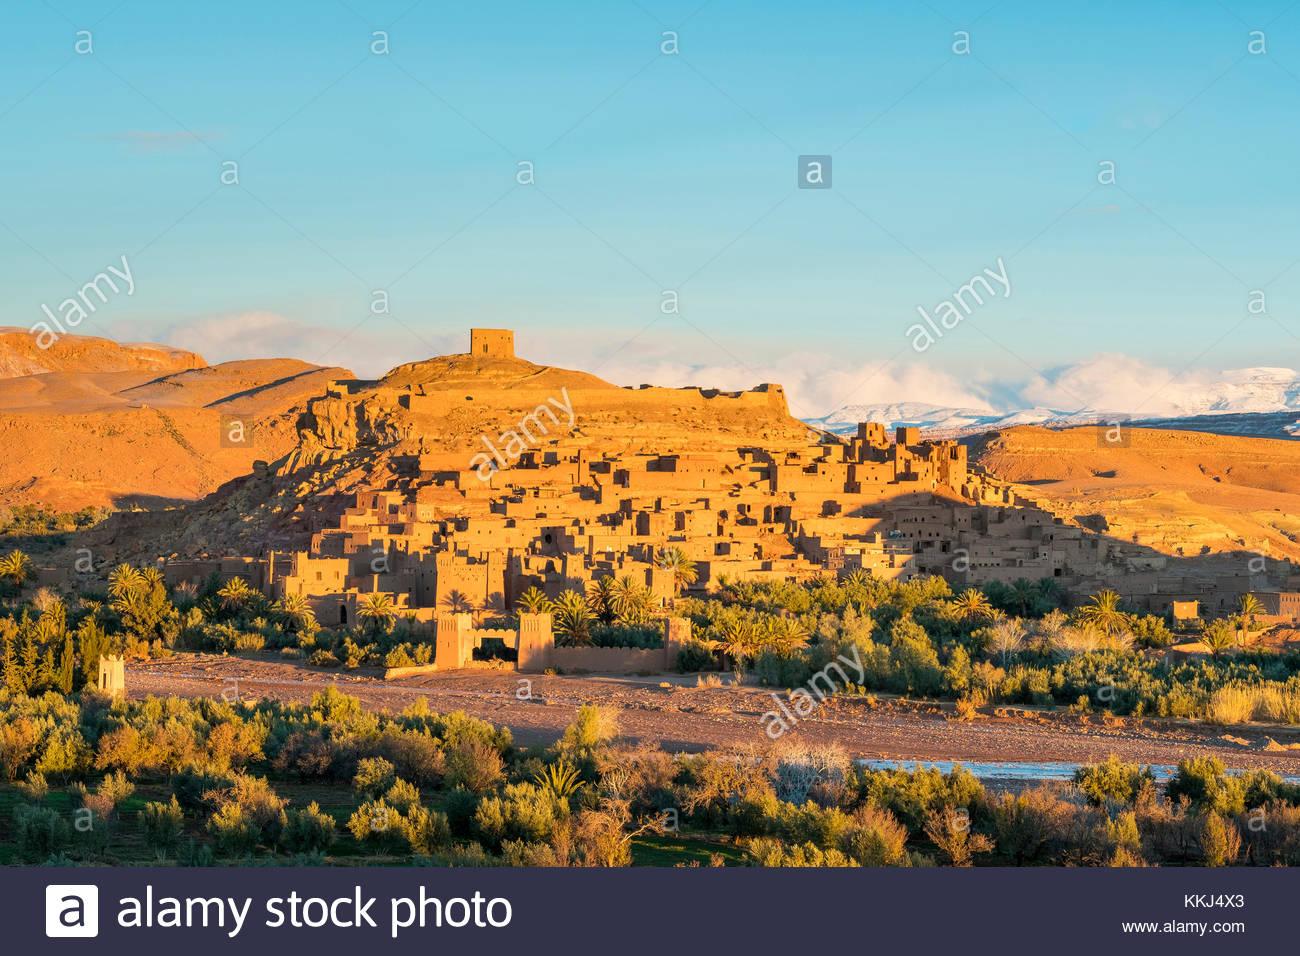 Le Maroc, Sous-Massa (Sous-Massa-Draa), Province de Ouarzazate. Ksar d'Ait Ben Haddou (Ait Benhaddou). Photo Stock